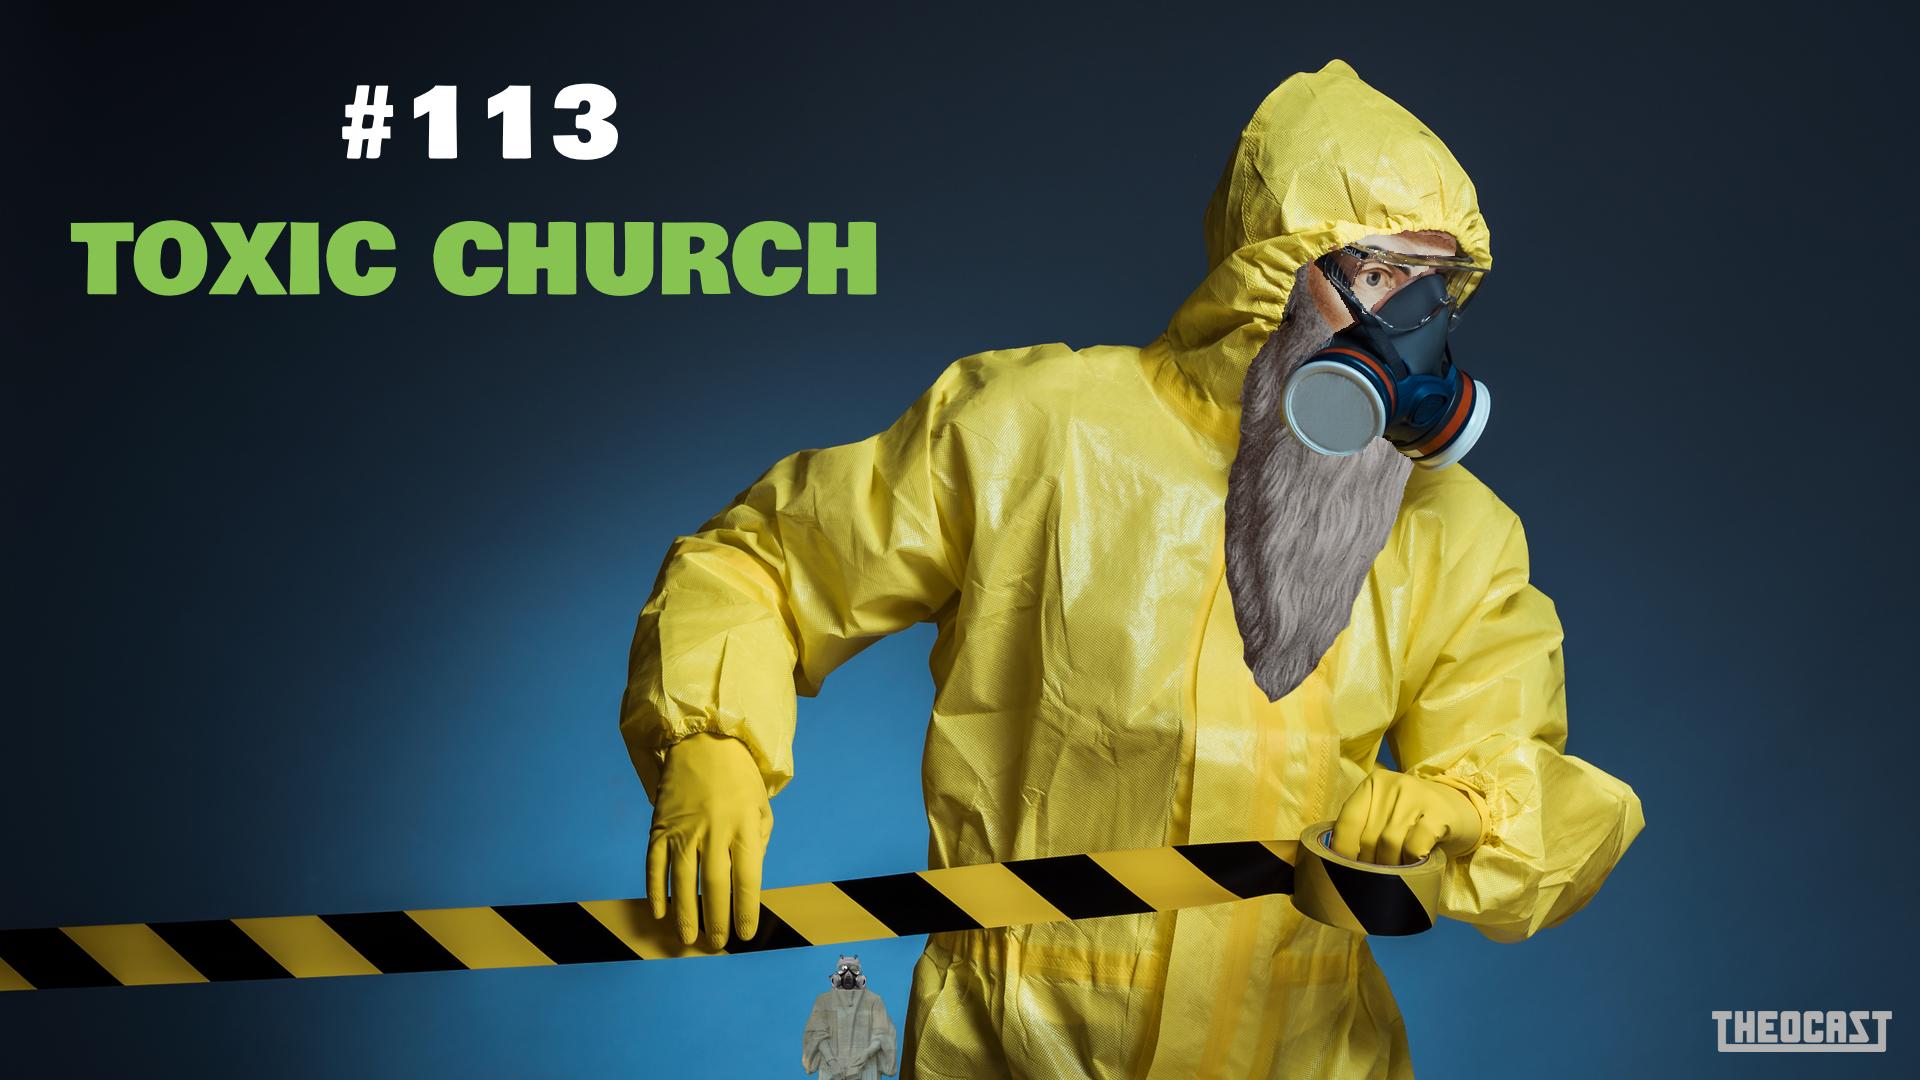 #113 Toxic Church